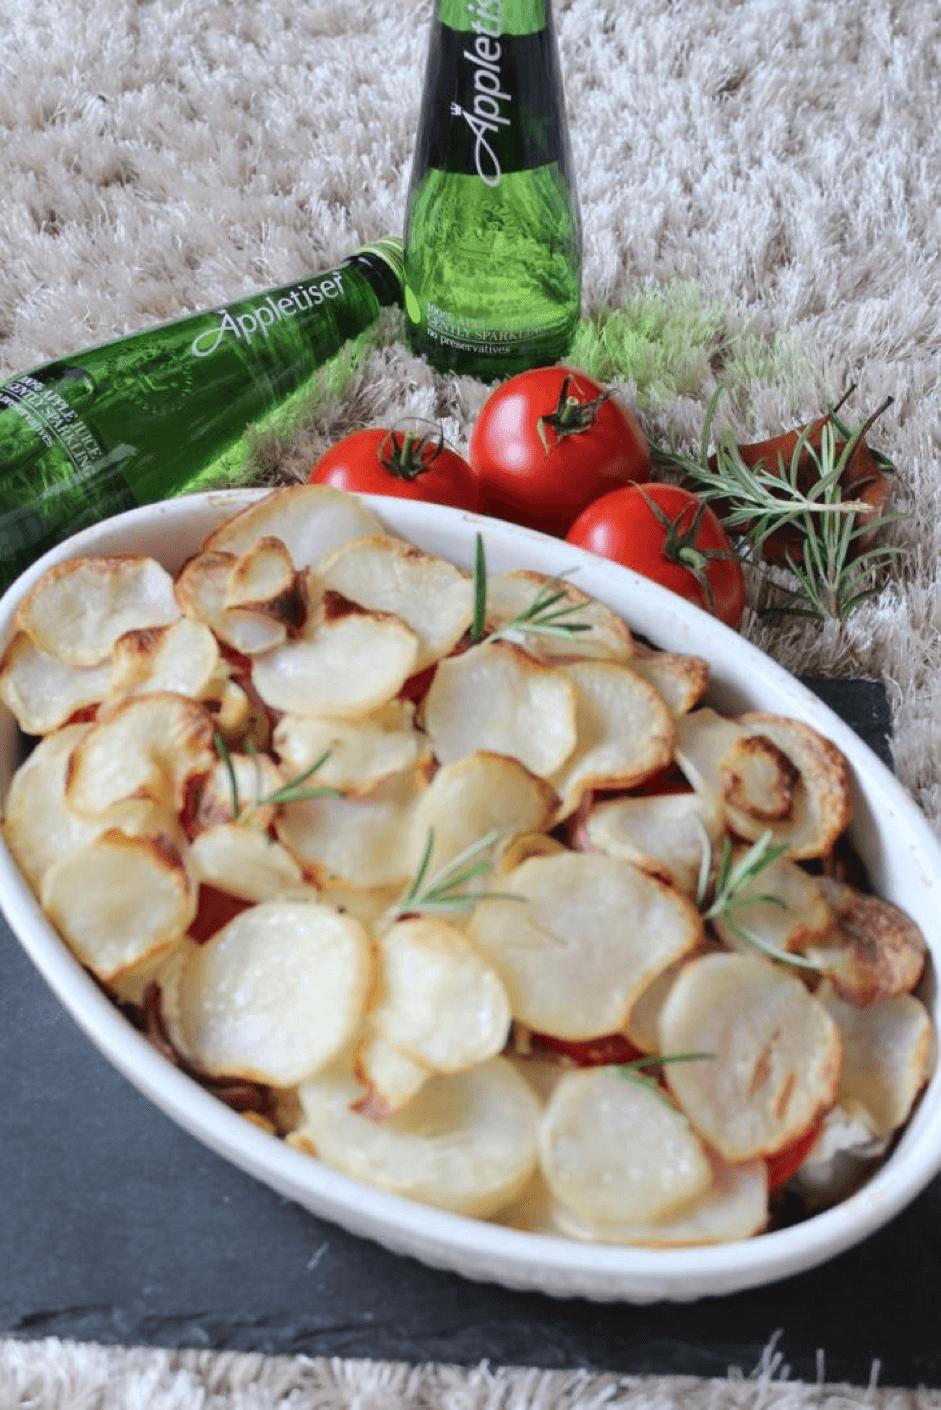 Aubergine potato gratin recipe